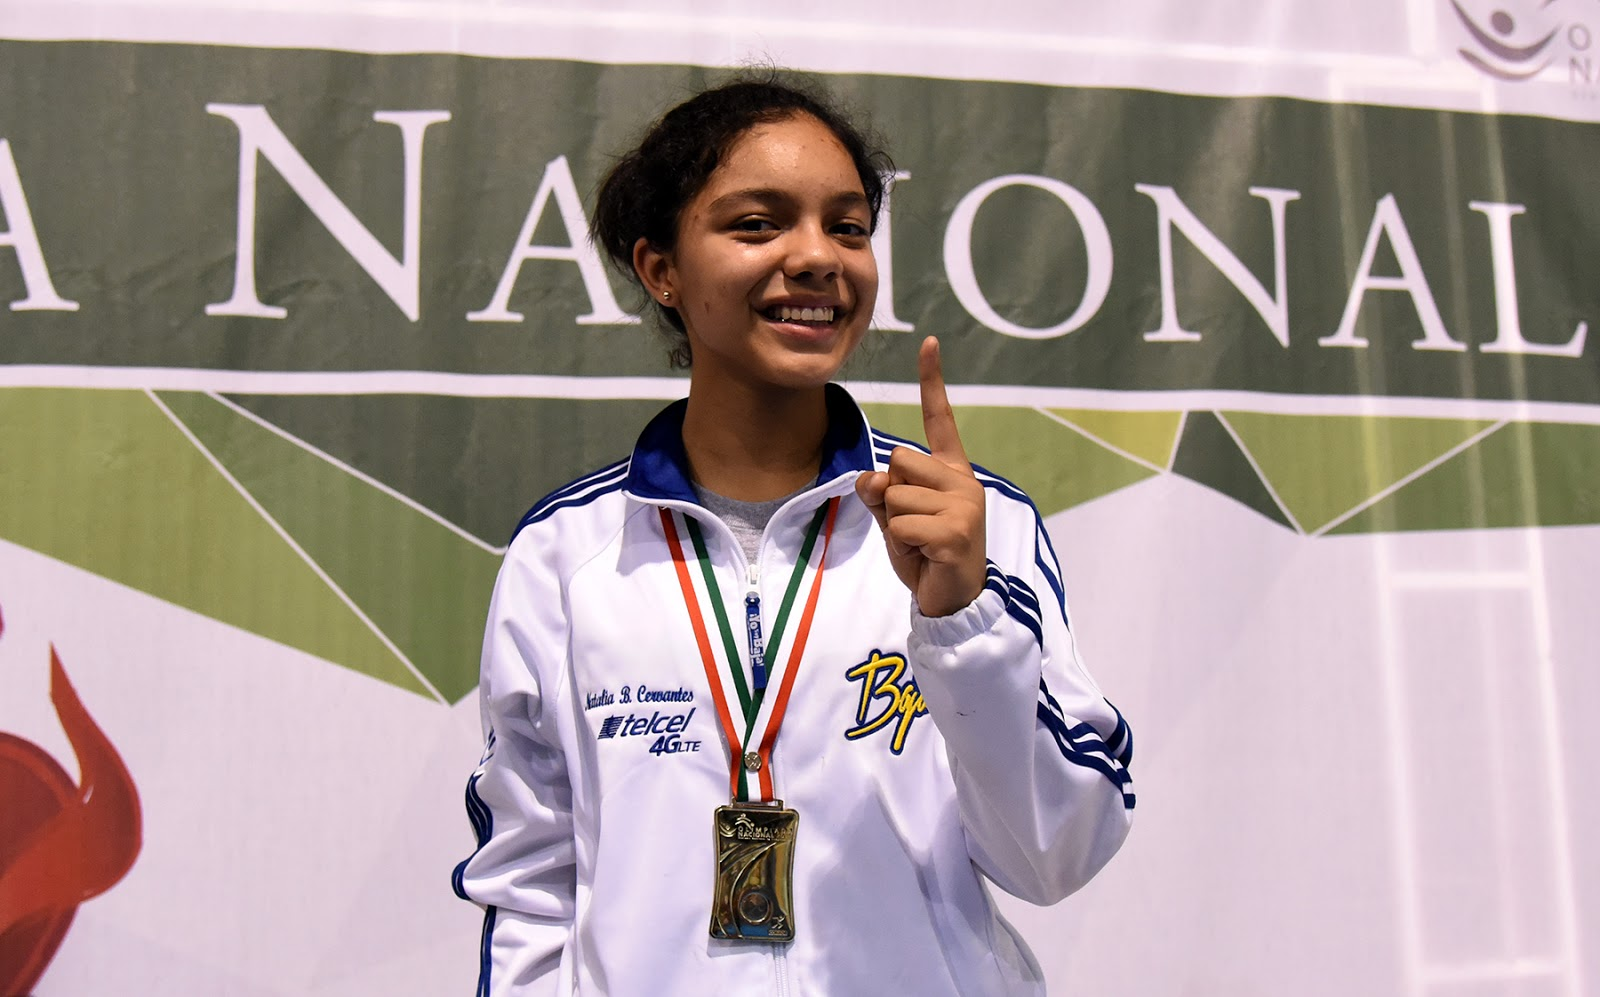 Natalia Botello, Sportgirl of the year according CCDT